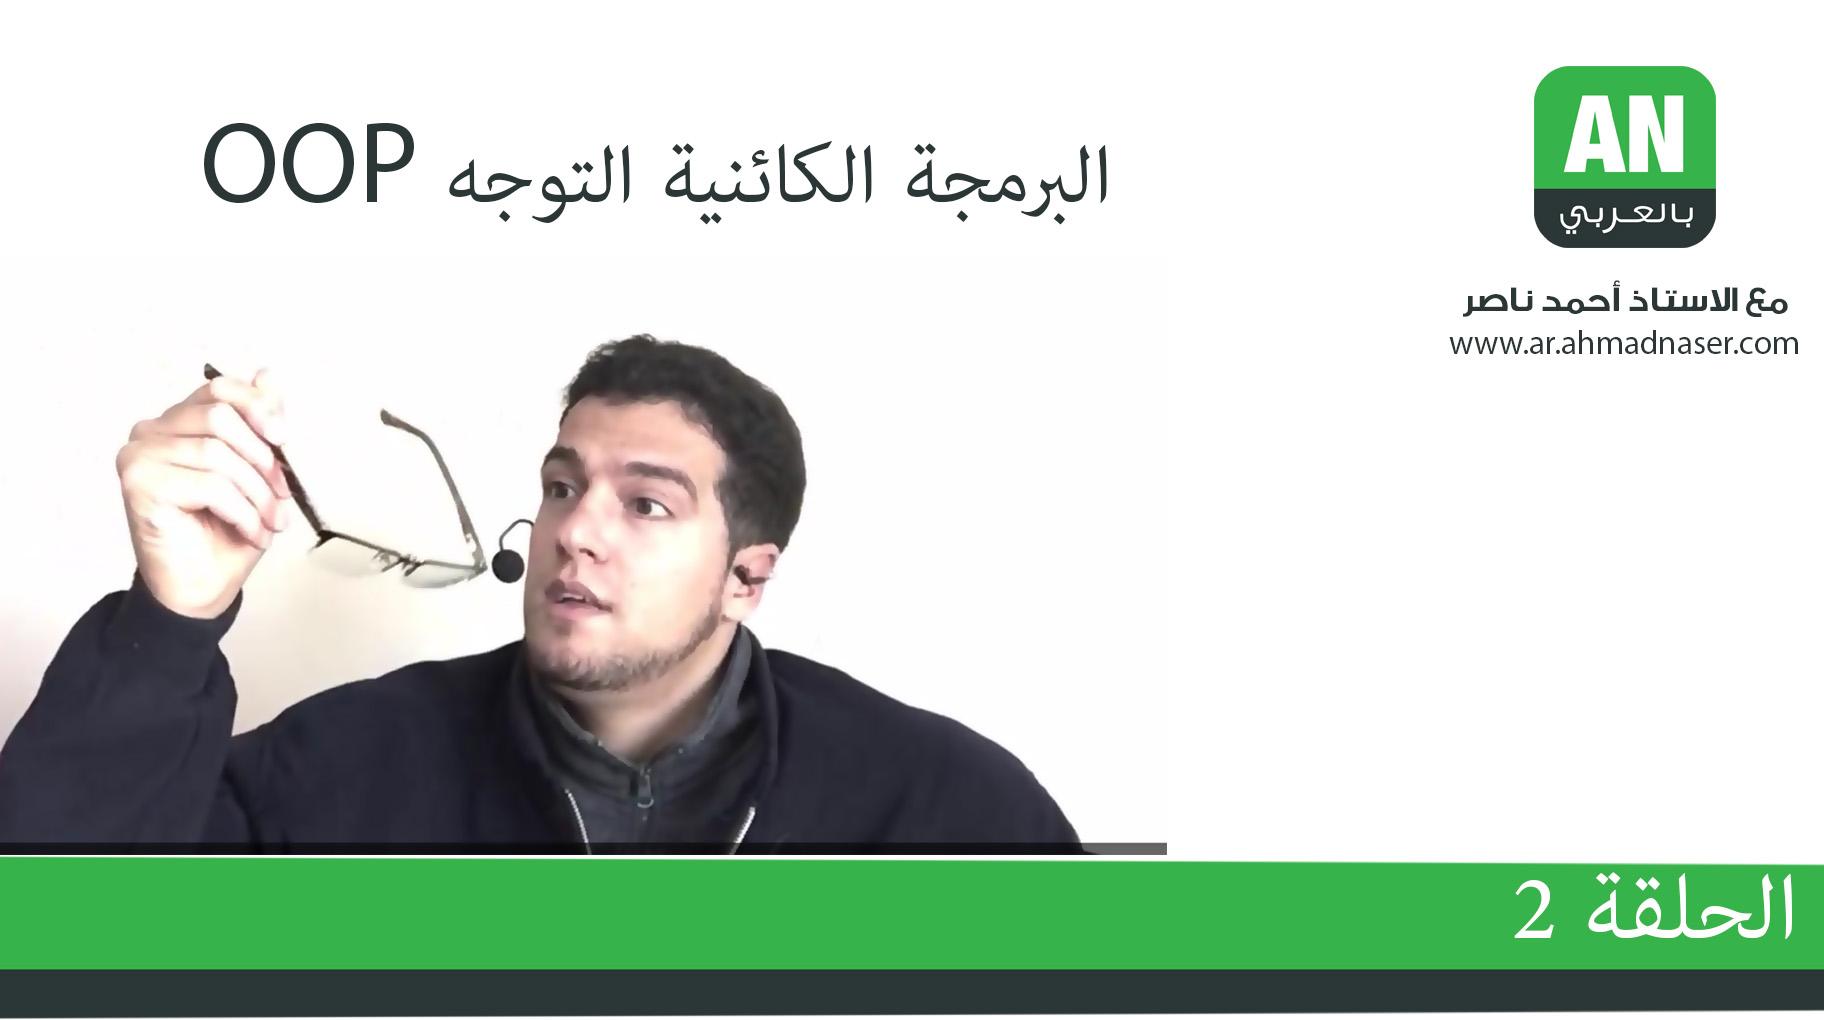 Photo of ANbilArabi الحلقة الثانية مع الاستاذ احمد ناصر البرمجة كائنية التوجه